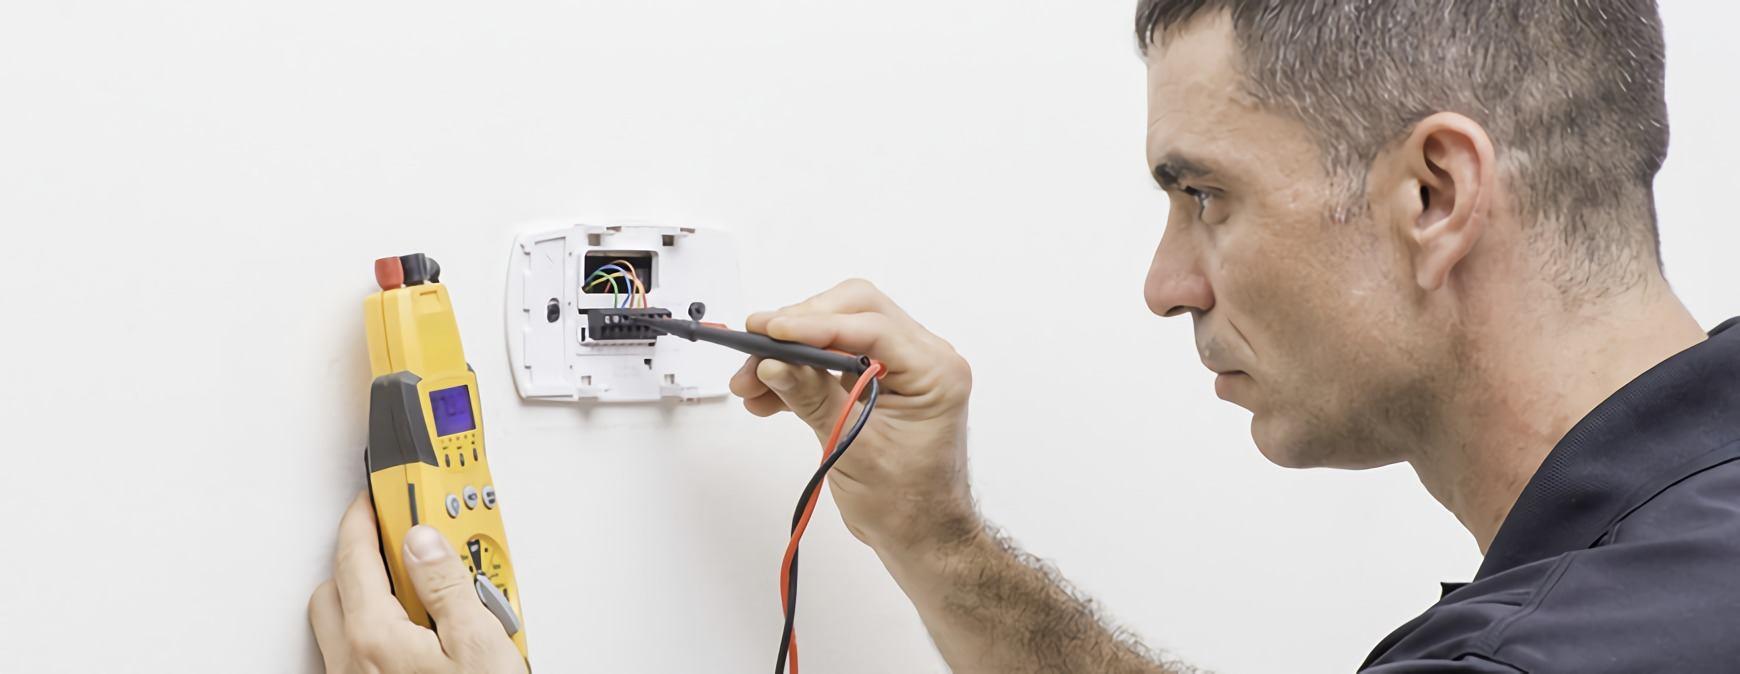 hvac technician wiring thermostat